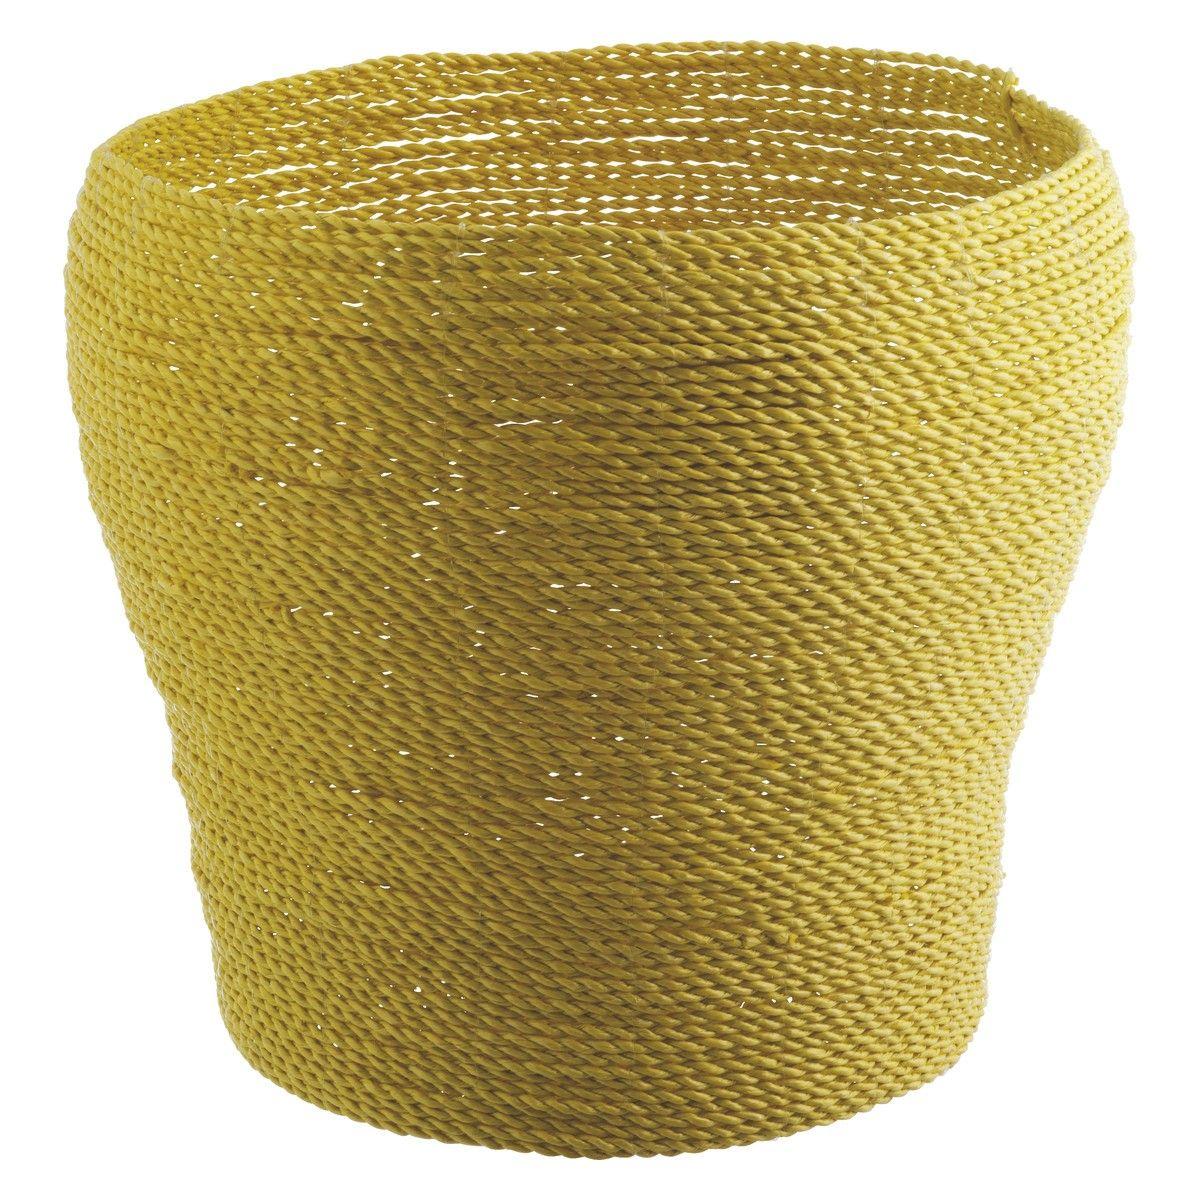 MORELL Grey Woven Plastic Storage Basket